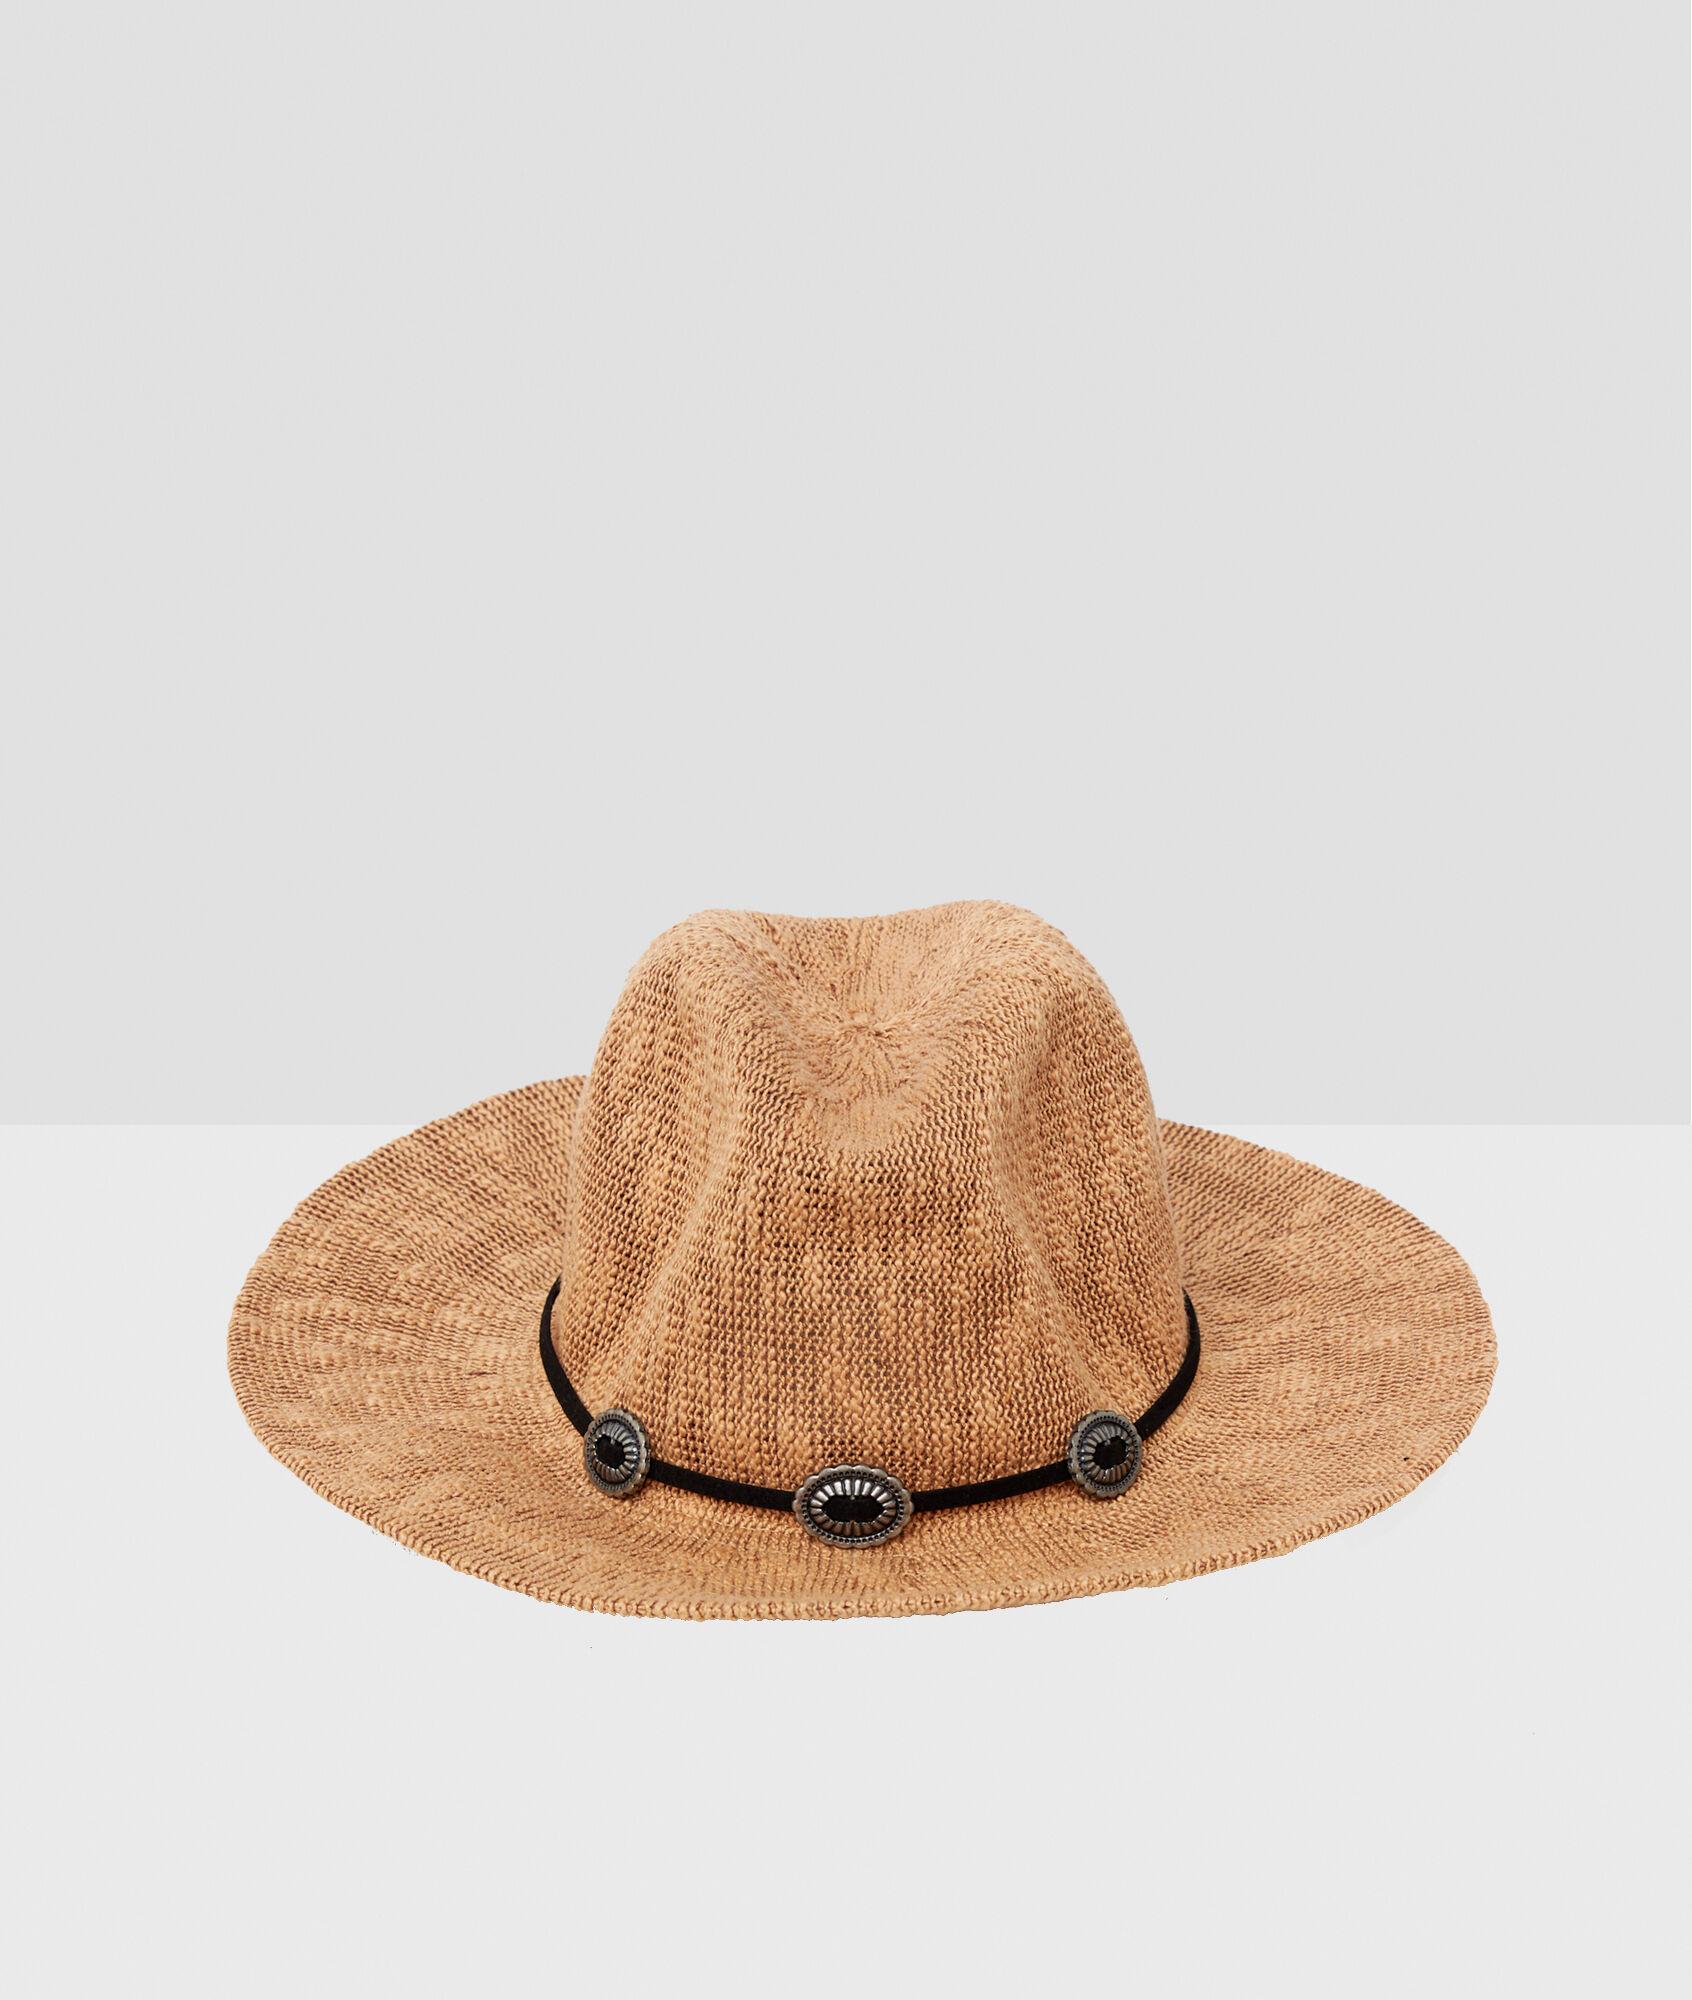 Sombrero playero tipo western - WESTERN - MARRÓN - Etam 561bd6183a2d